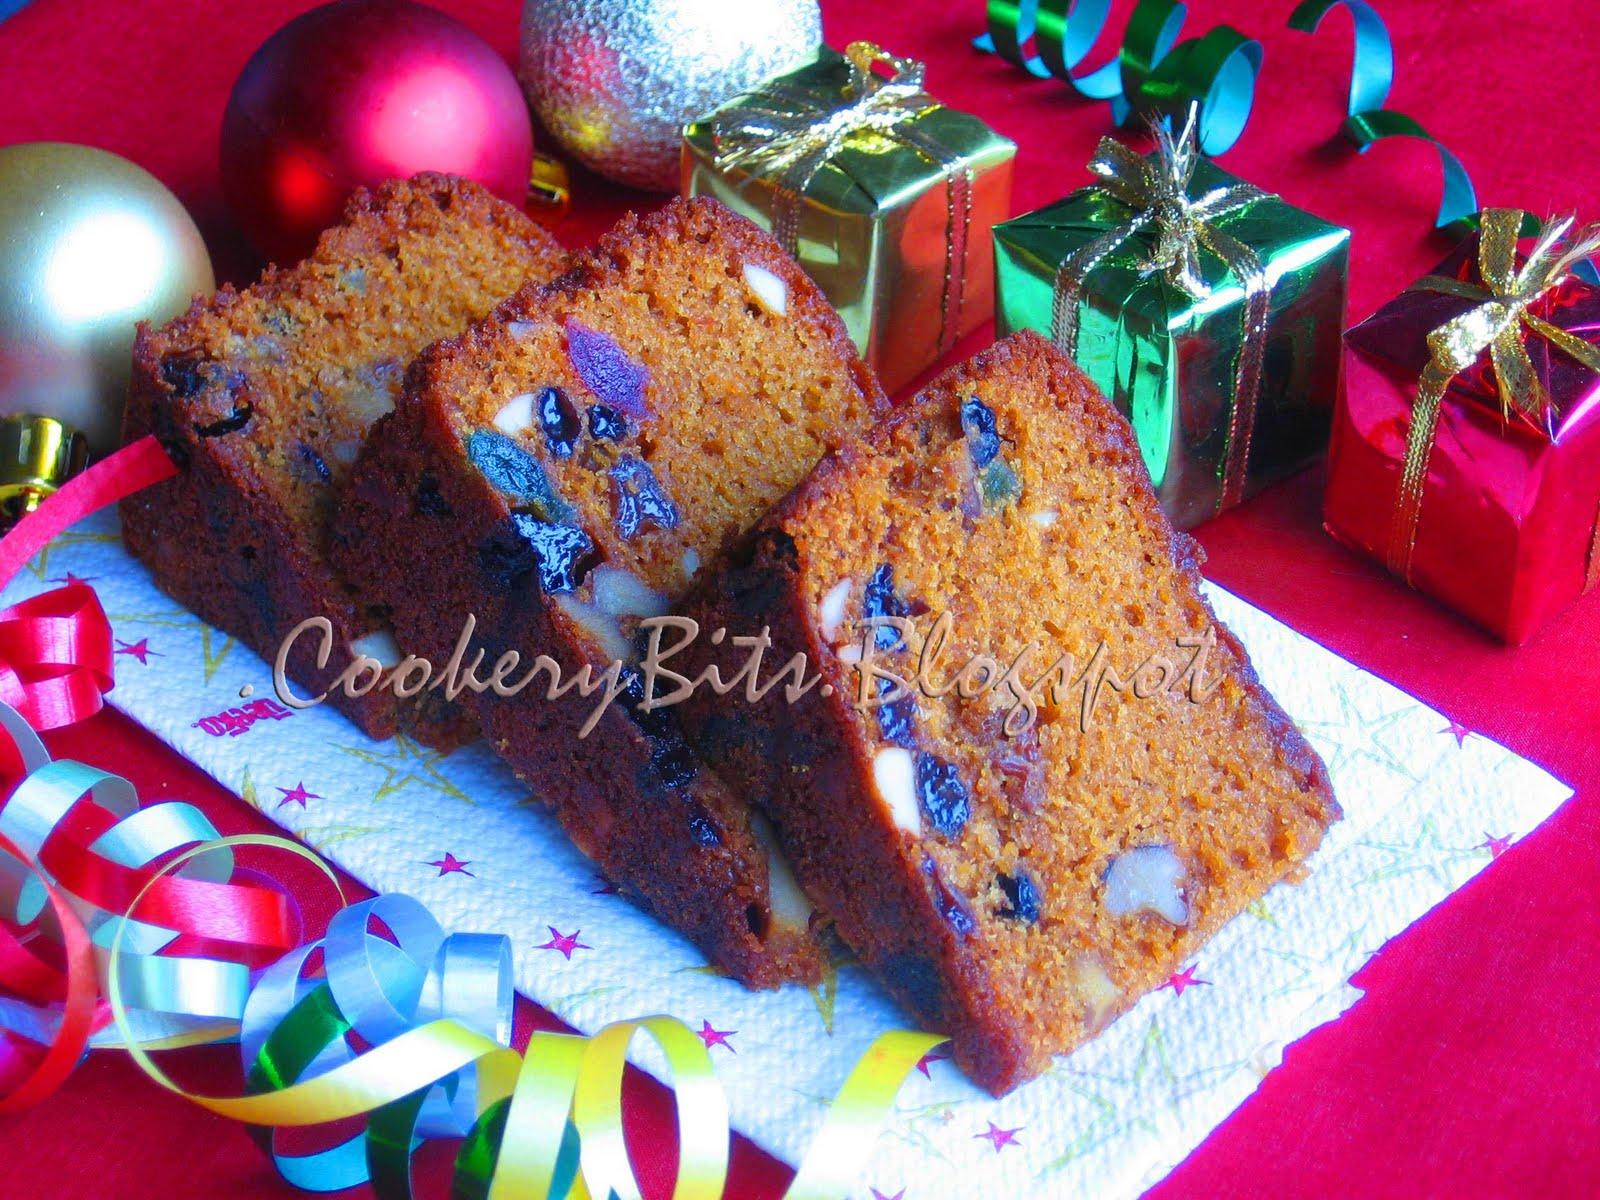 Cookery Bits: Christmas fruit cake/ plum cake (Kerala speciality)